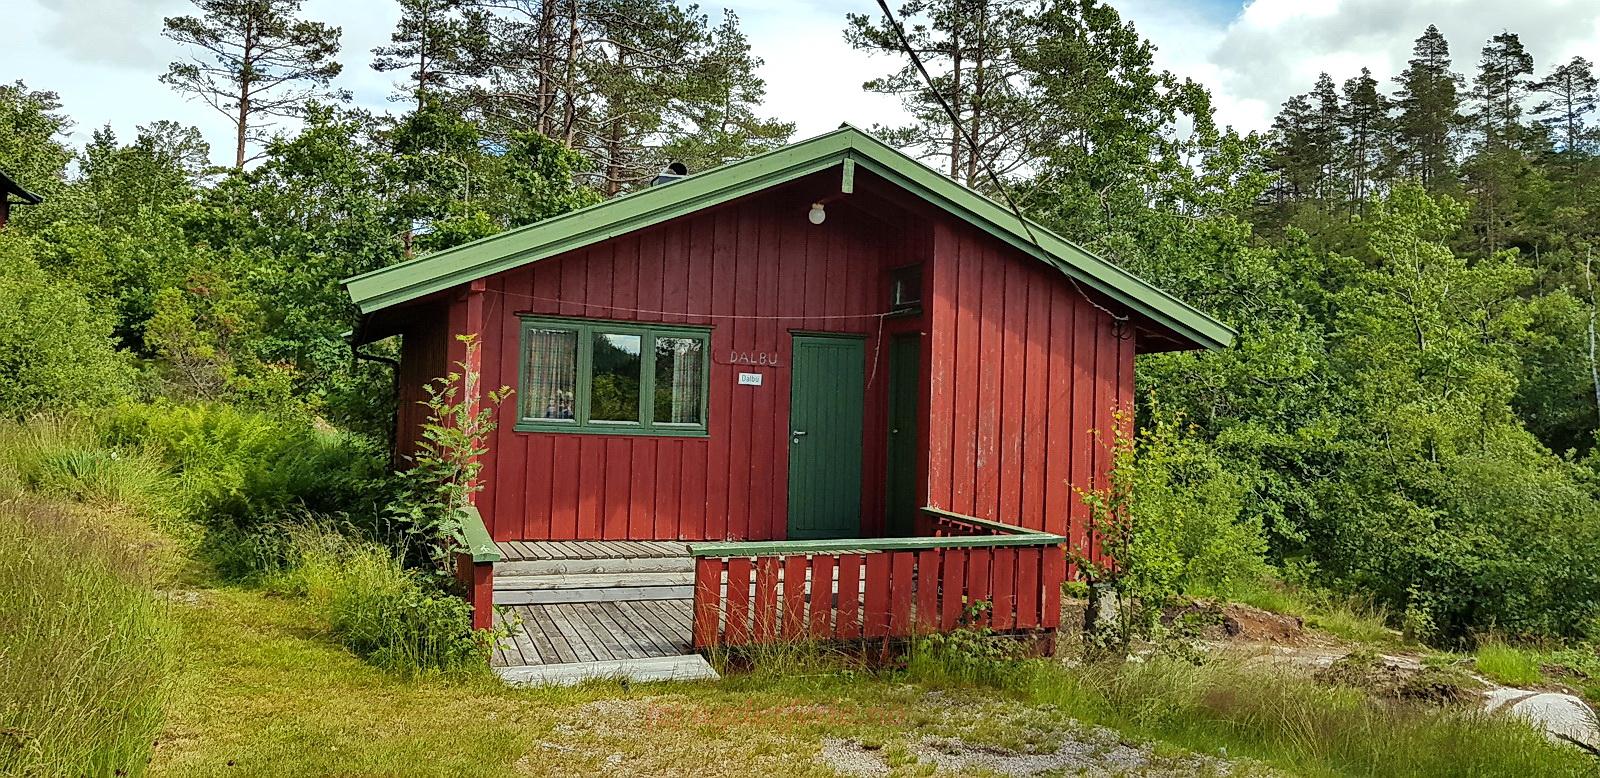 209 Dalbu. Undeland Gård. Kvås i Agder.